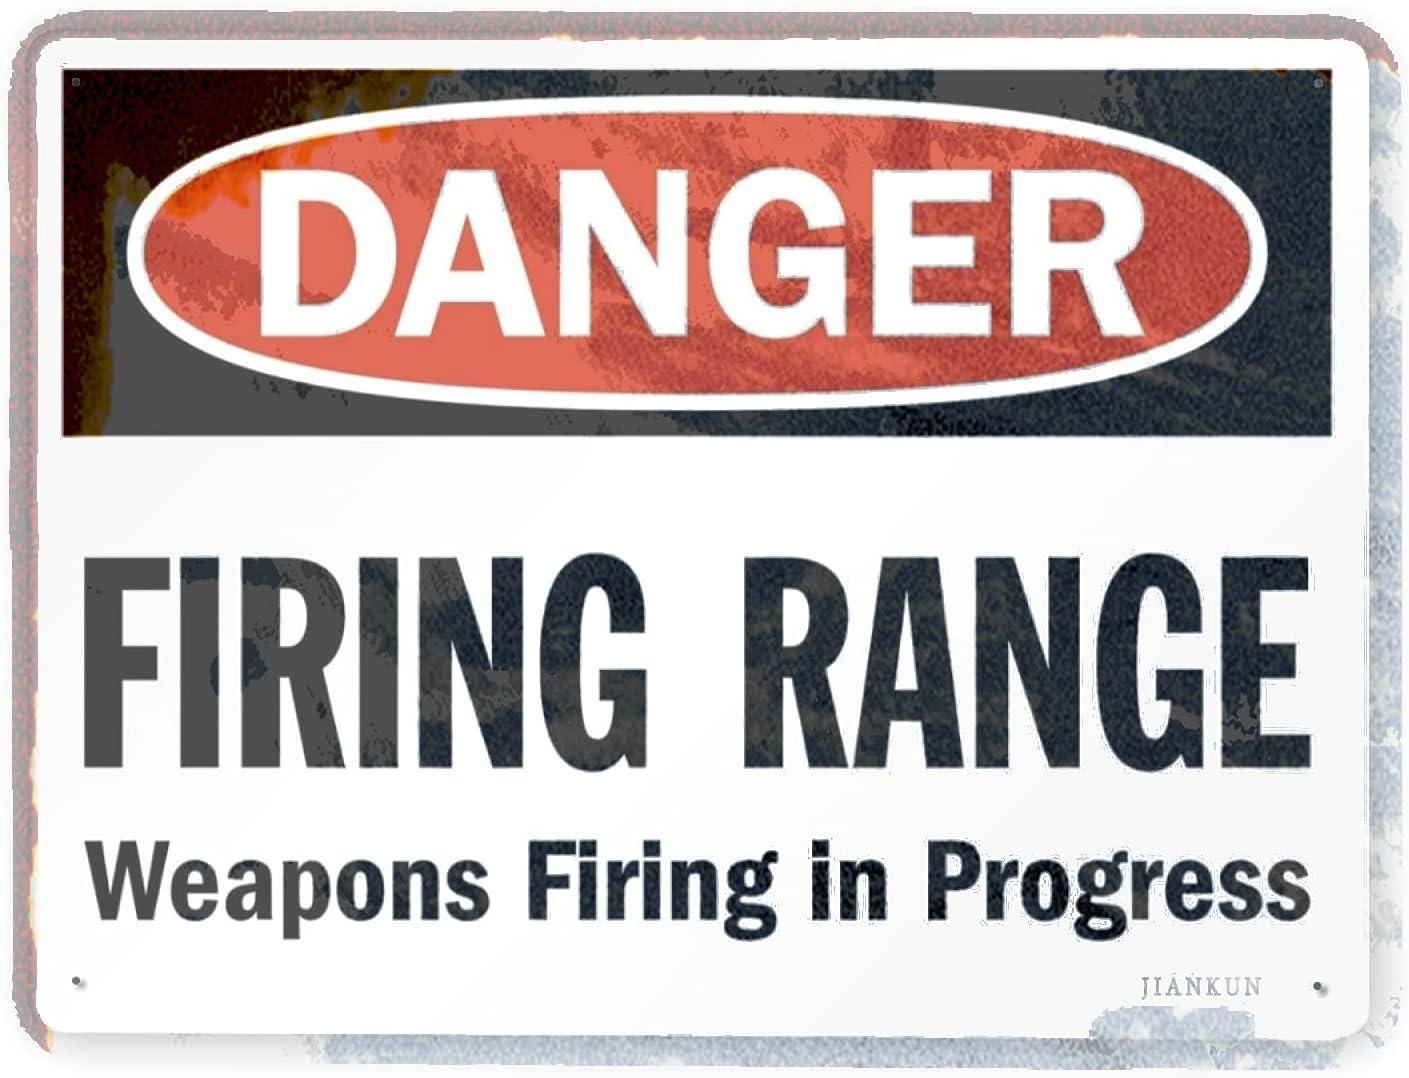 J.DXHYA Man Cave Decor 2 Pieces Max 64% OFF Shooting Warning Dang Range Sign Miami Mall